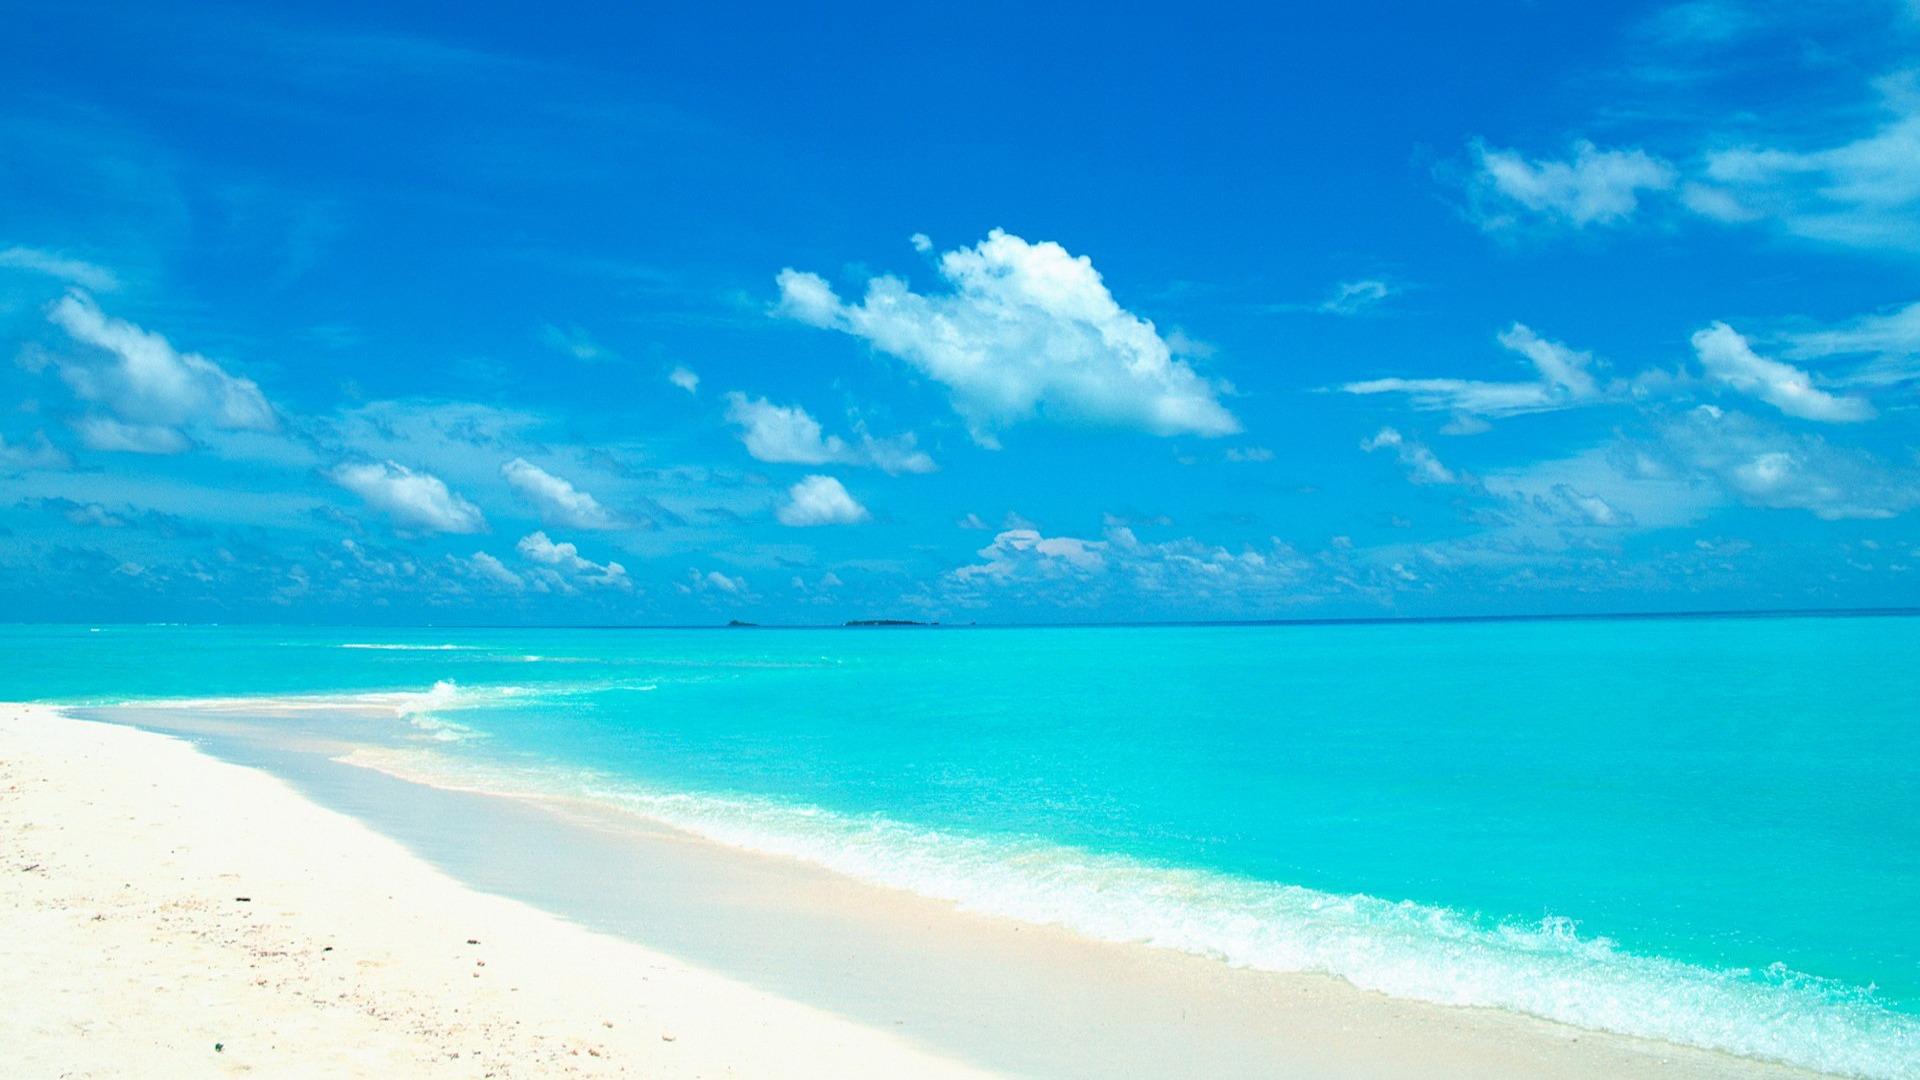 Beautiful Beach Wallpaper 7628 1920x1080